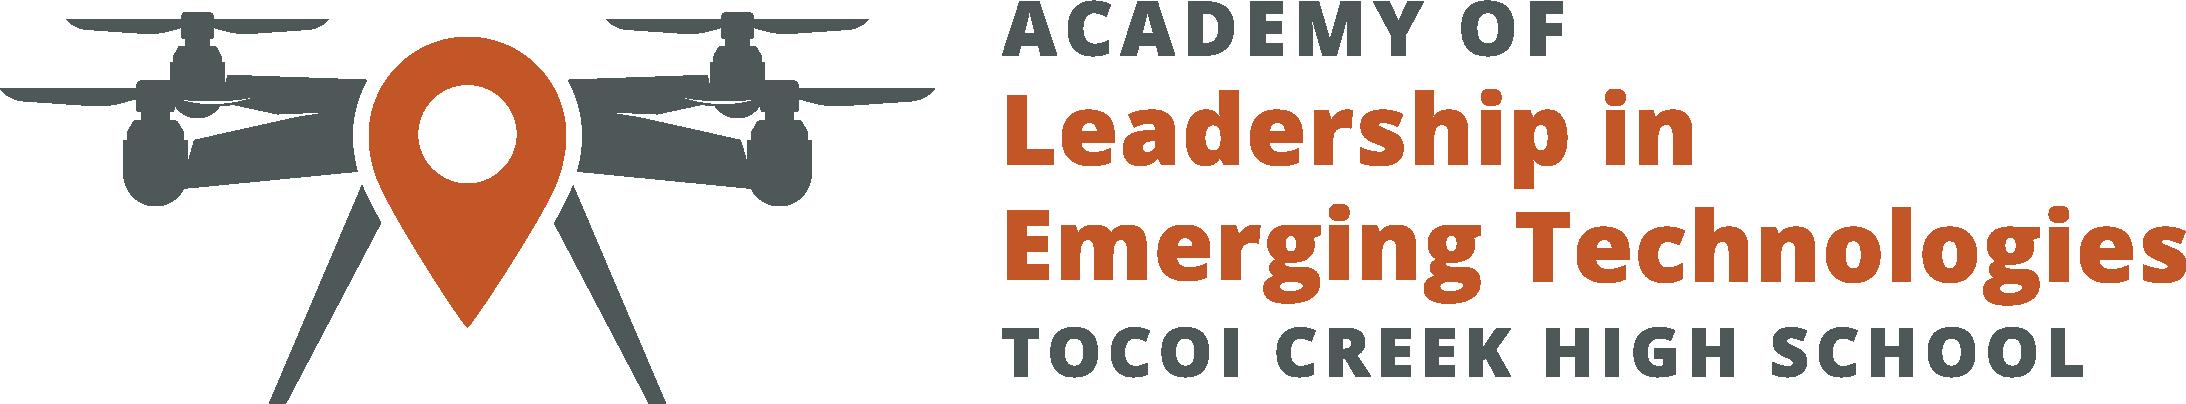 Academy of Leadership in Emerging Technologies